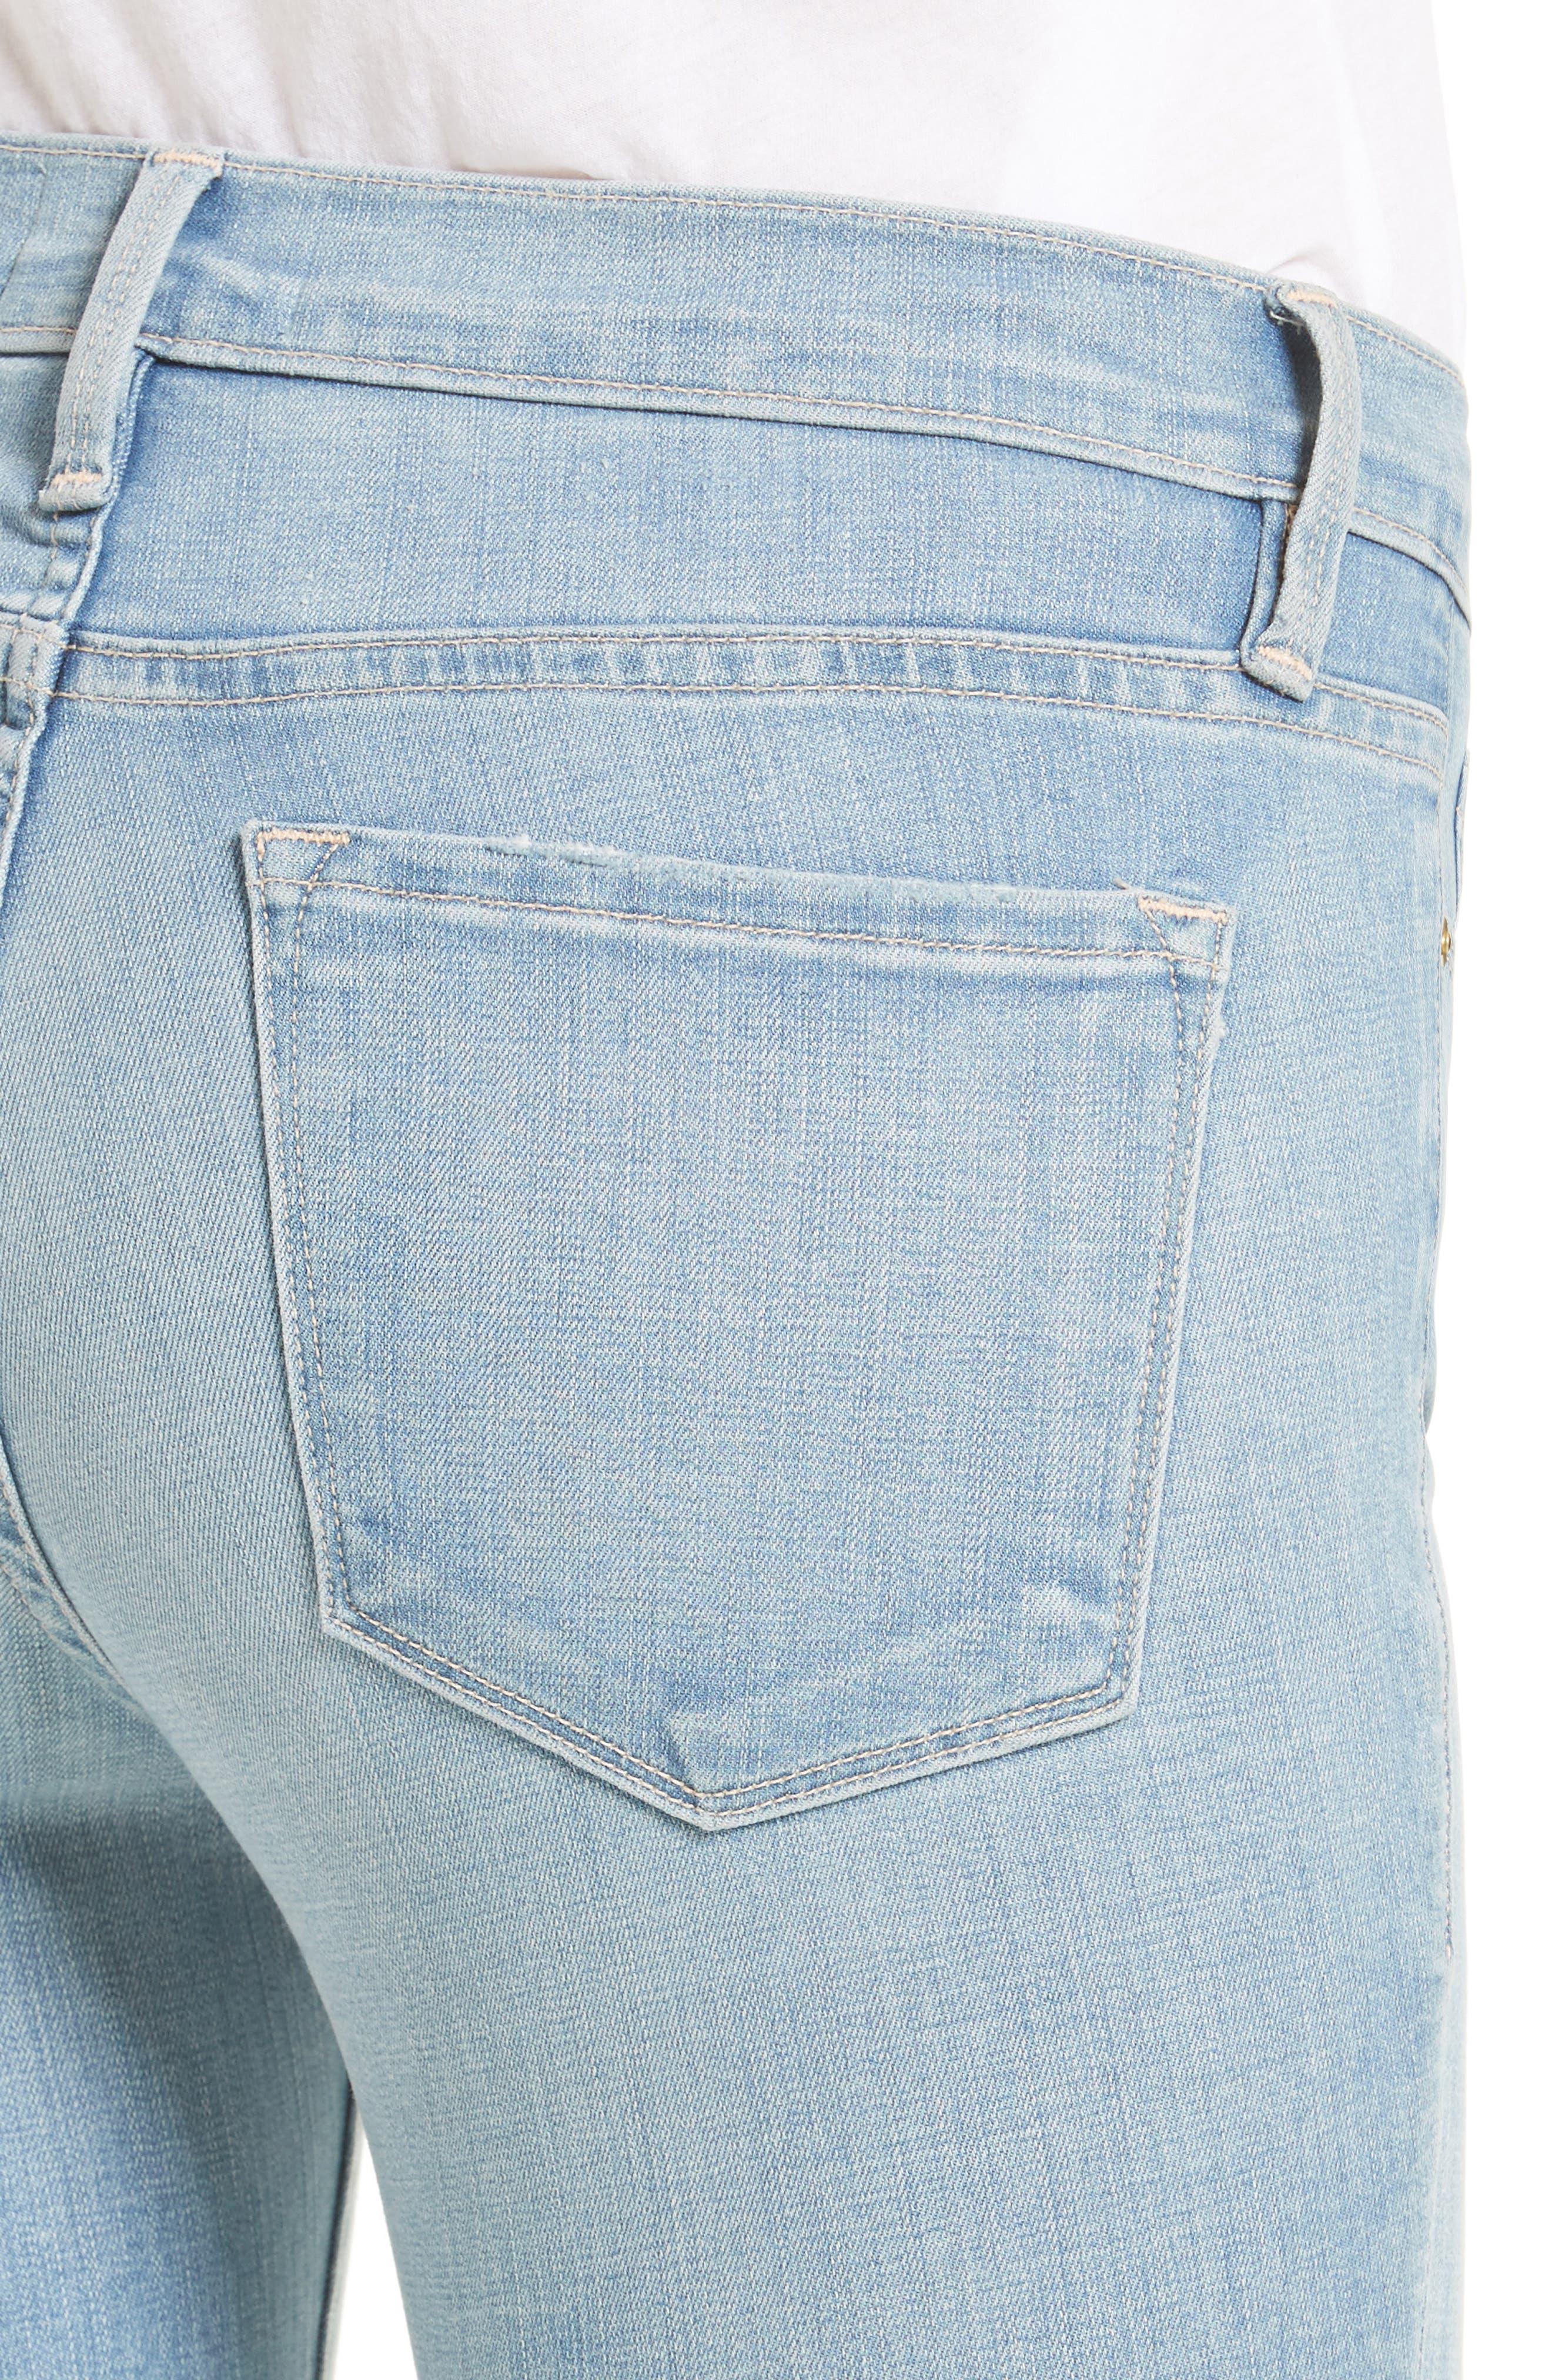 Alternate Image 4  - FRAME 'Le Skinny de Jeanne' Jeans (Antibes)